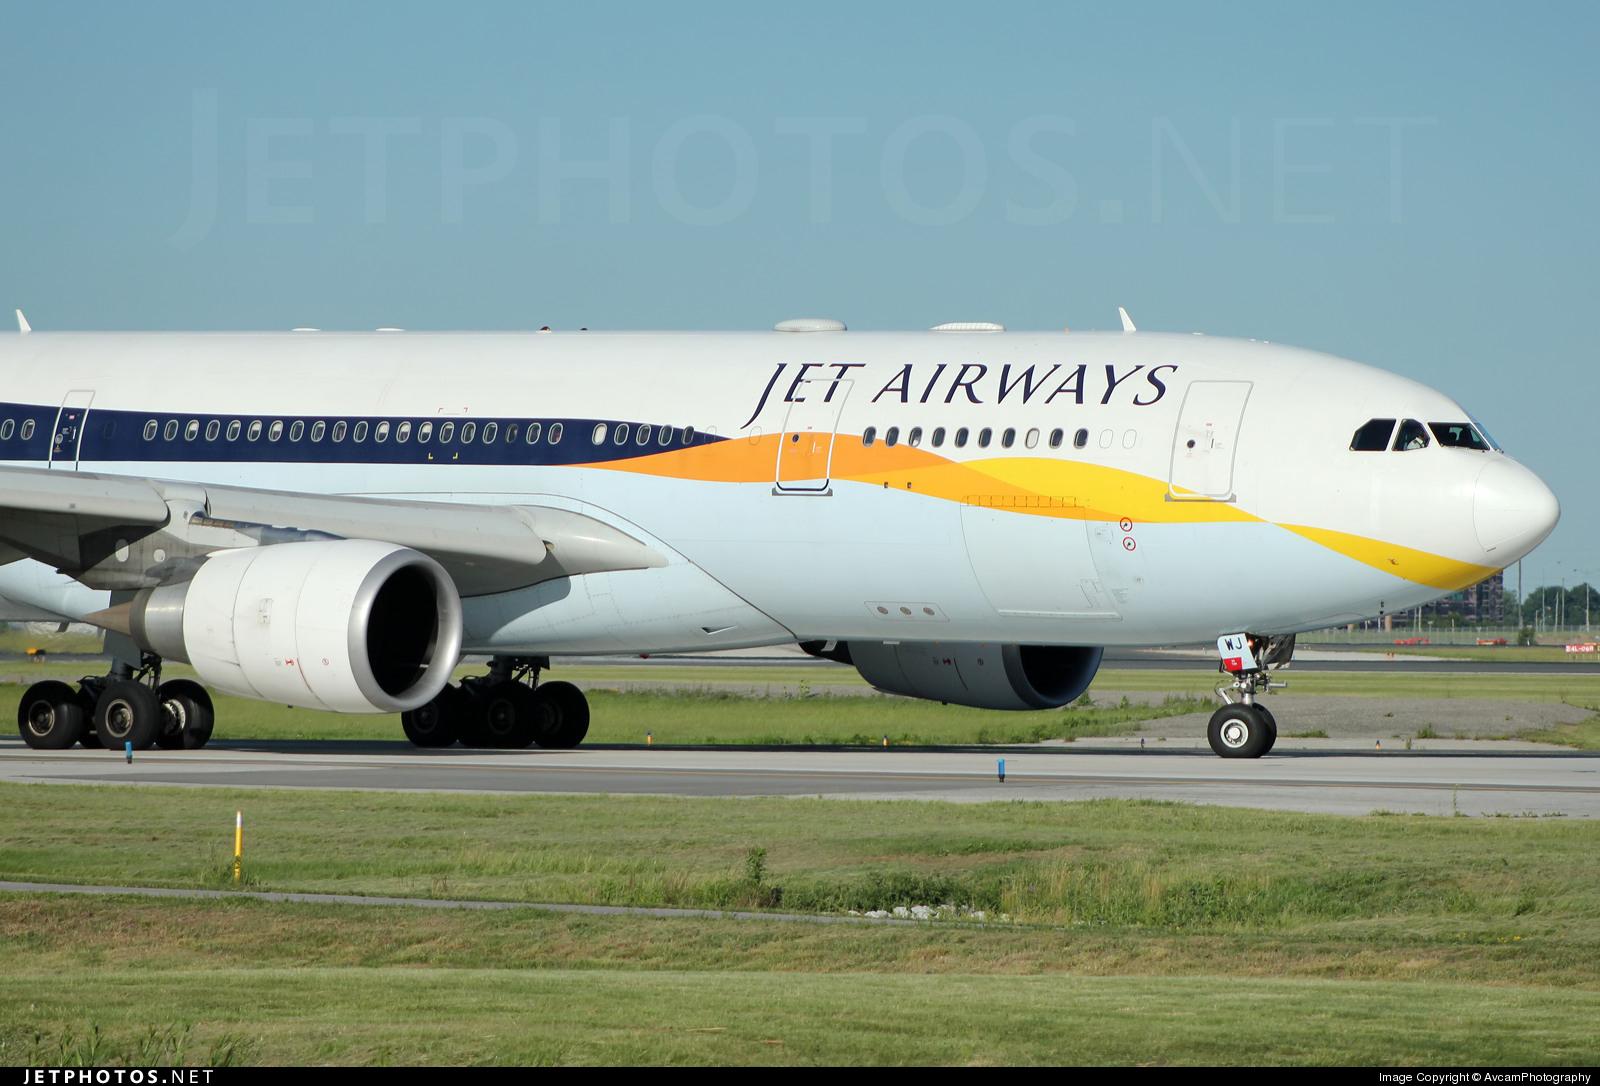 VT-JWJ - Airbus A330-202 - Jet Airways